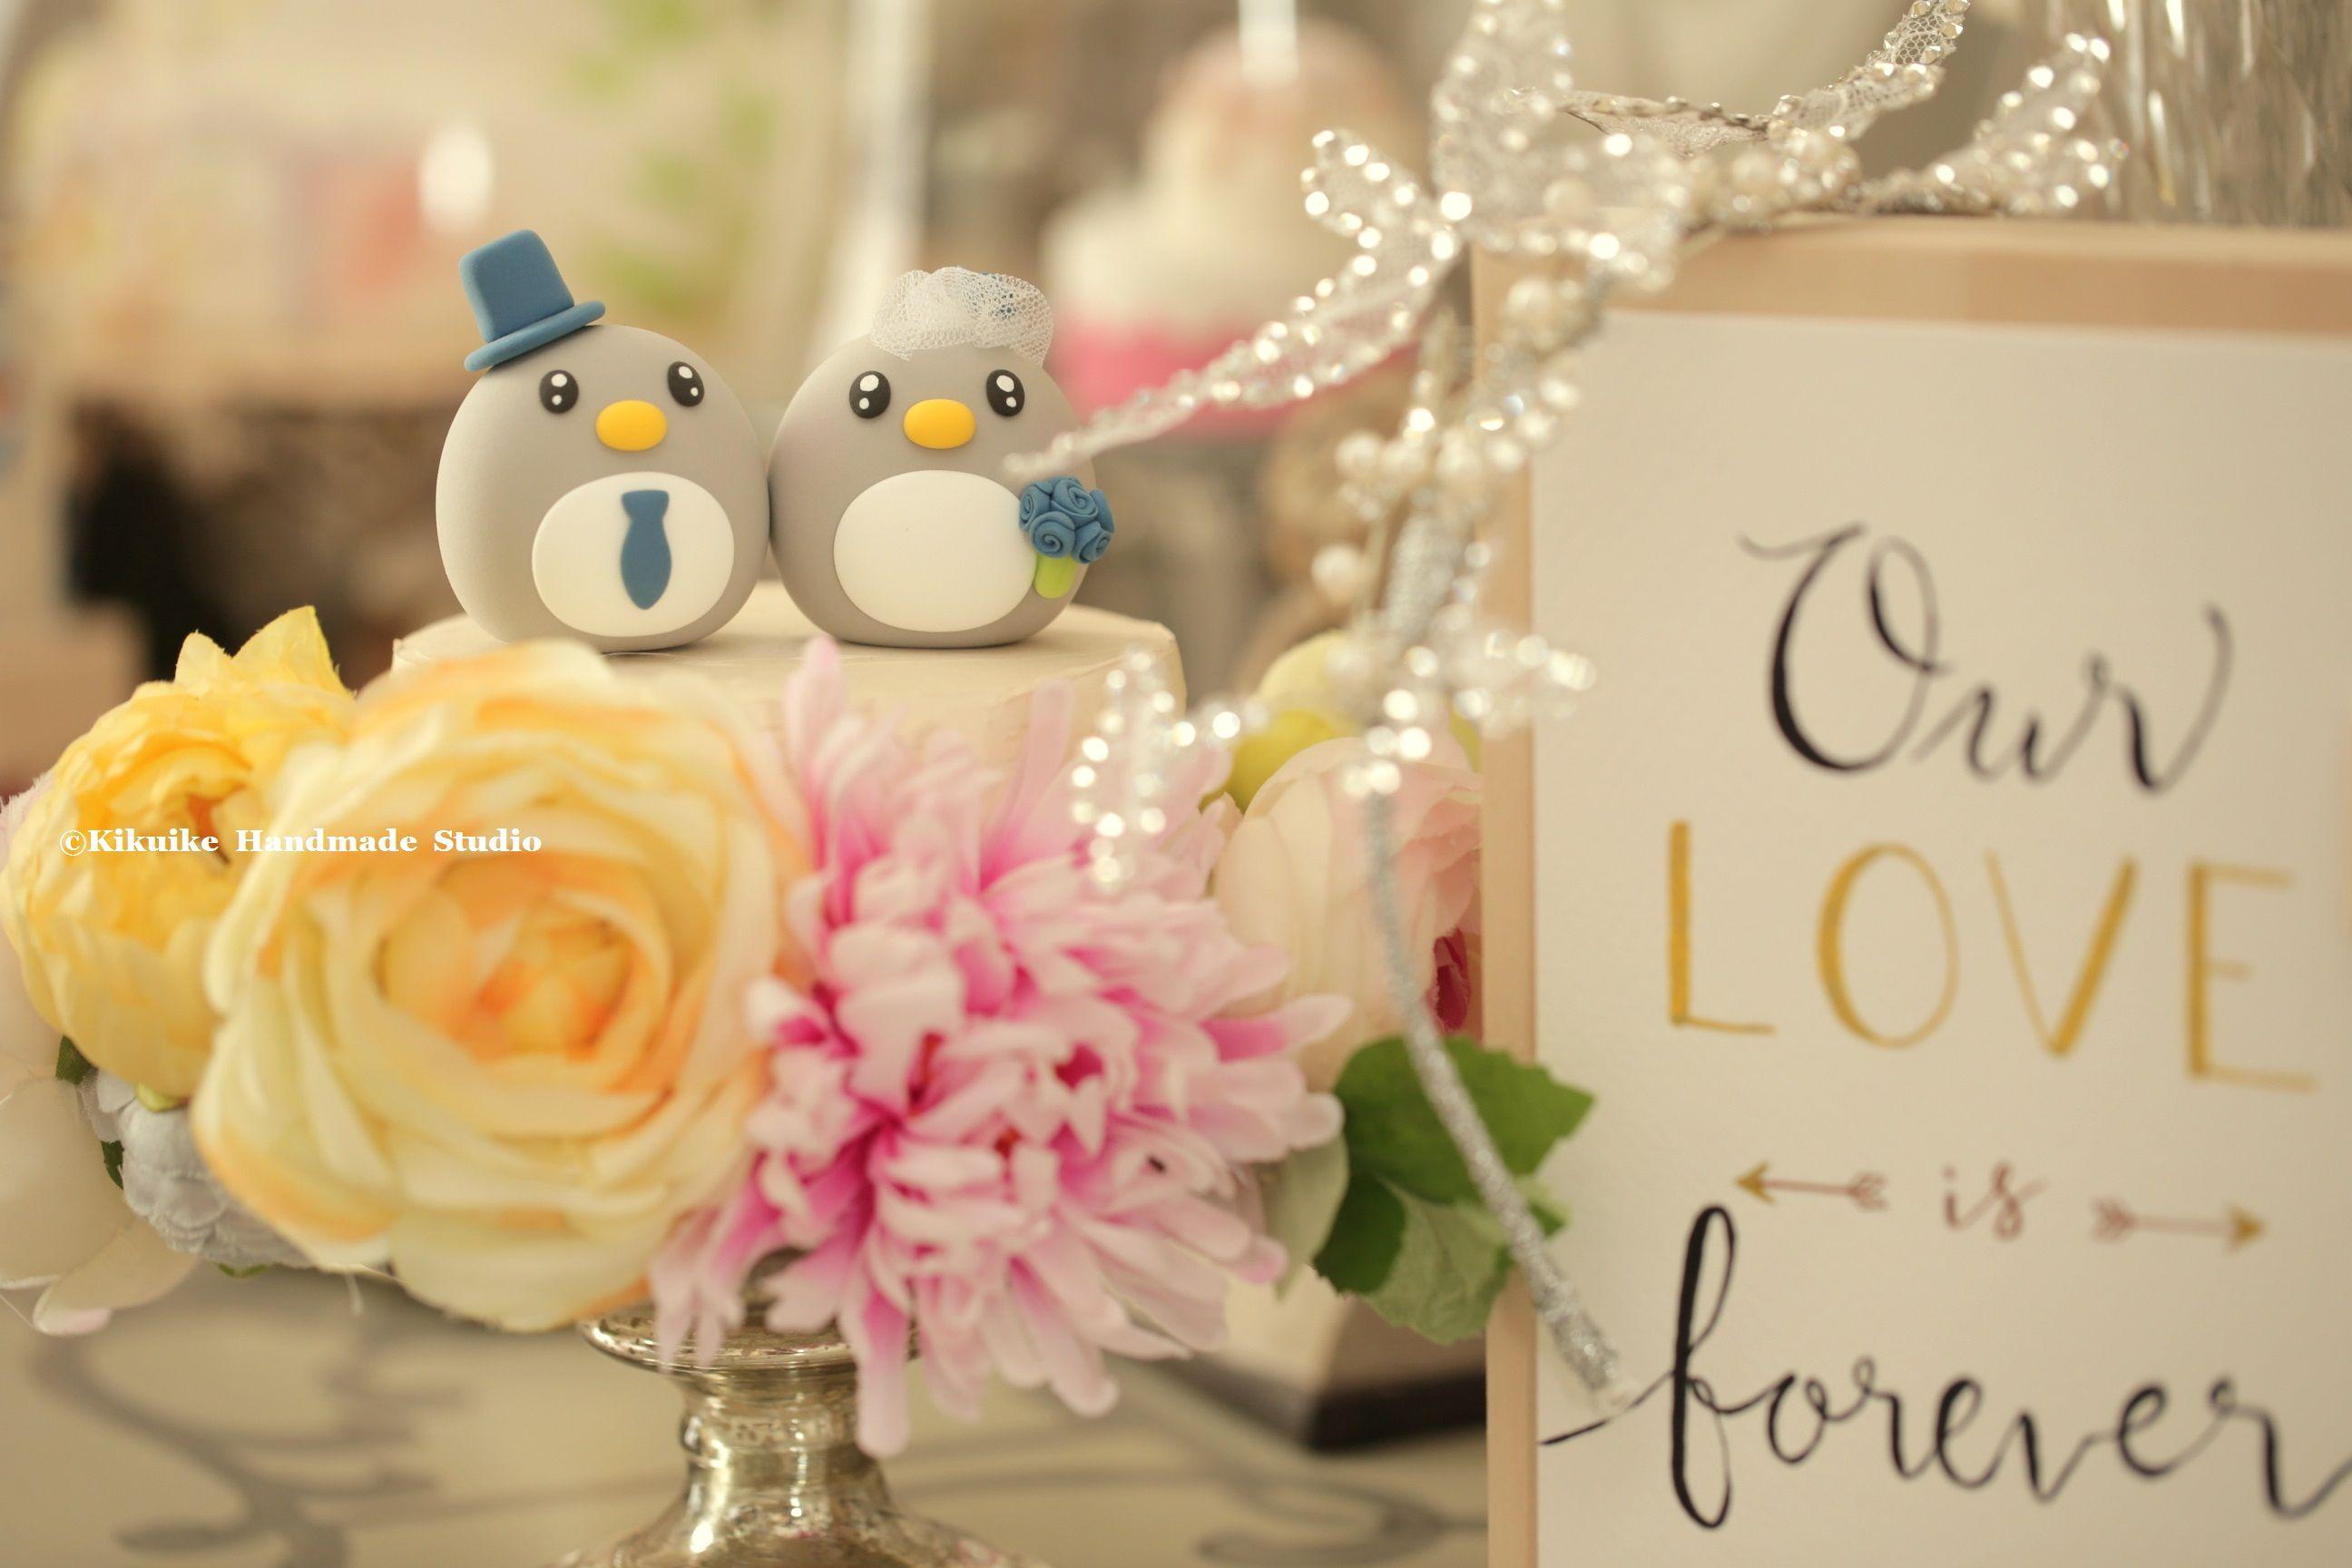 Penguins bride and groom MochiEgg custom wedding cake topper, cute ...